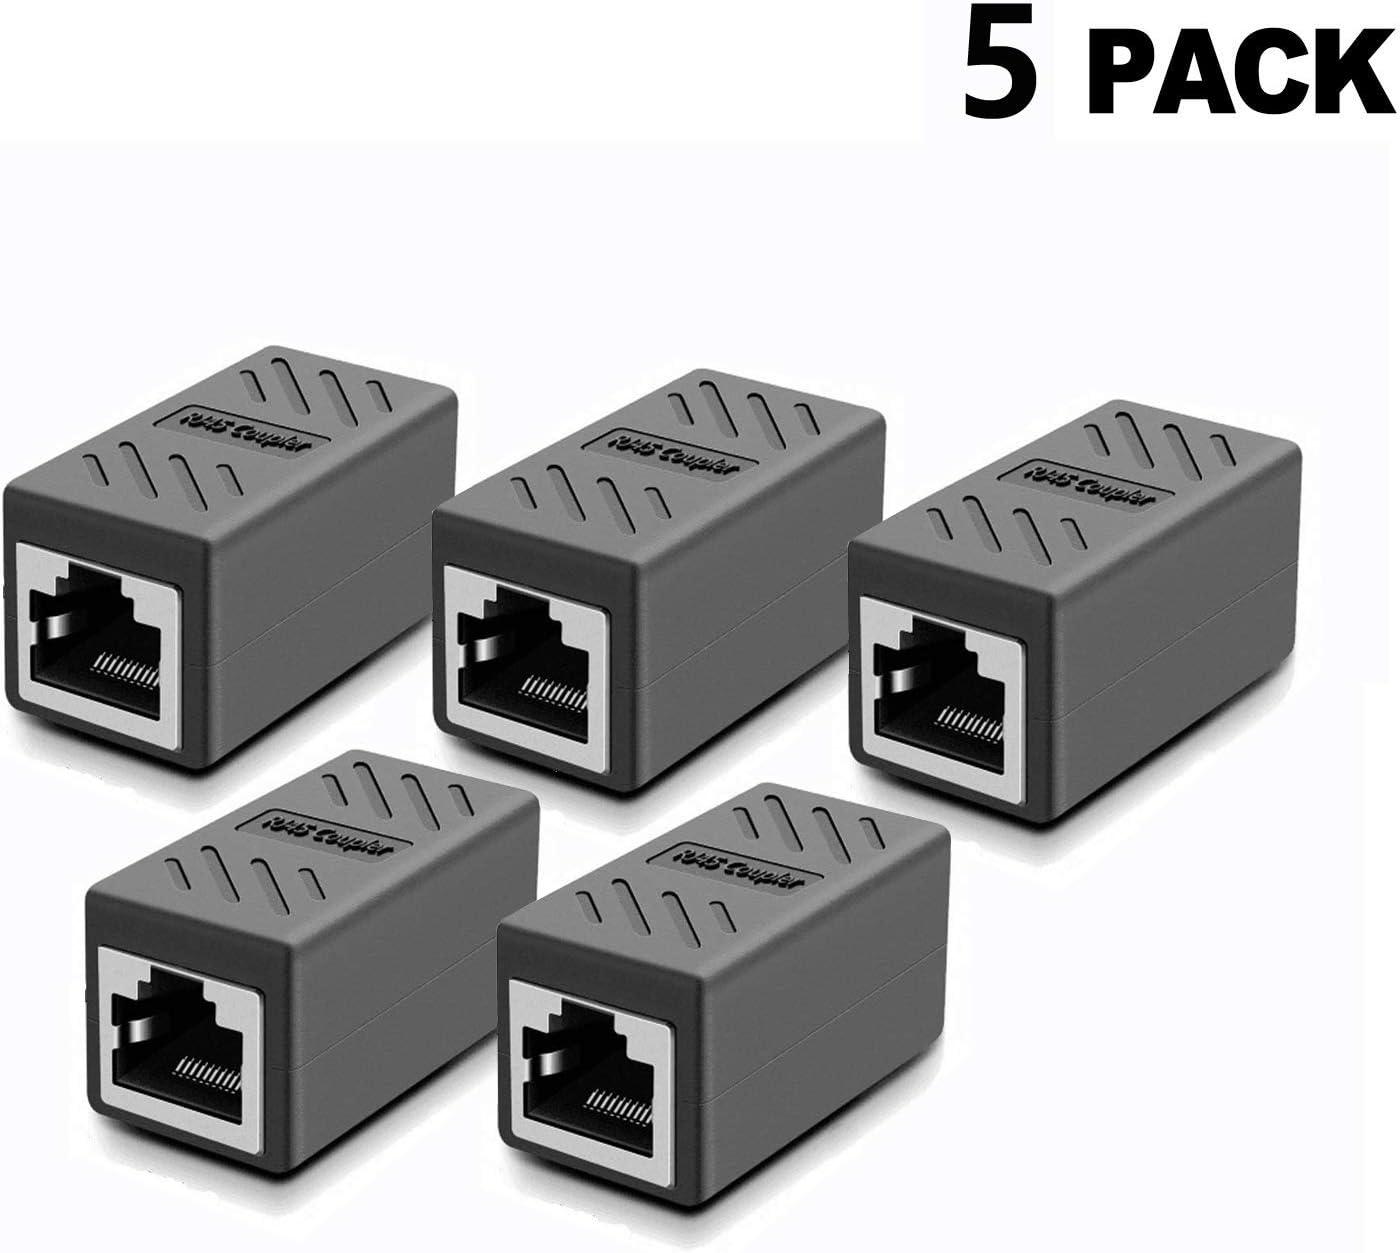 RJ45 Coupler Network Coupler Ethernet Connectors Hielded in-Line Coupler for Cat7//Cat6//Cat5e//Cat5 Female to Female Ethernet Cable Extender Connector Black-5 Pack